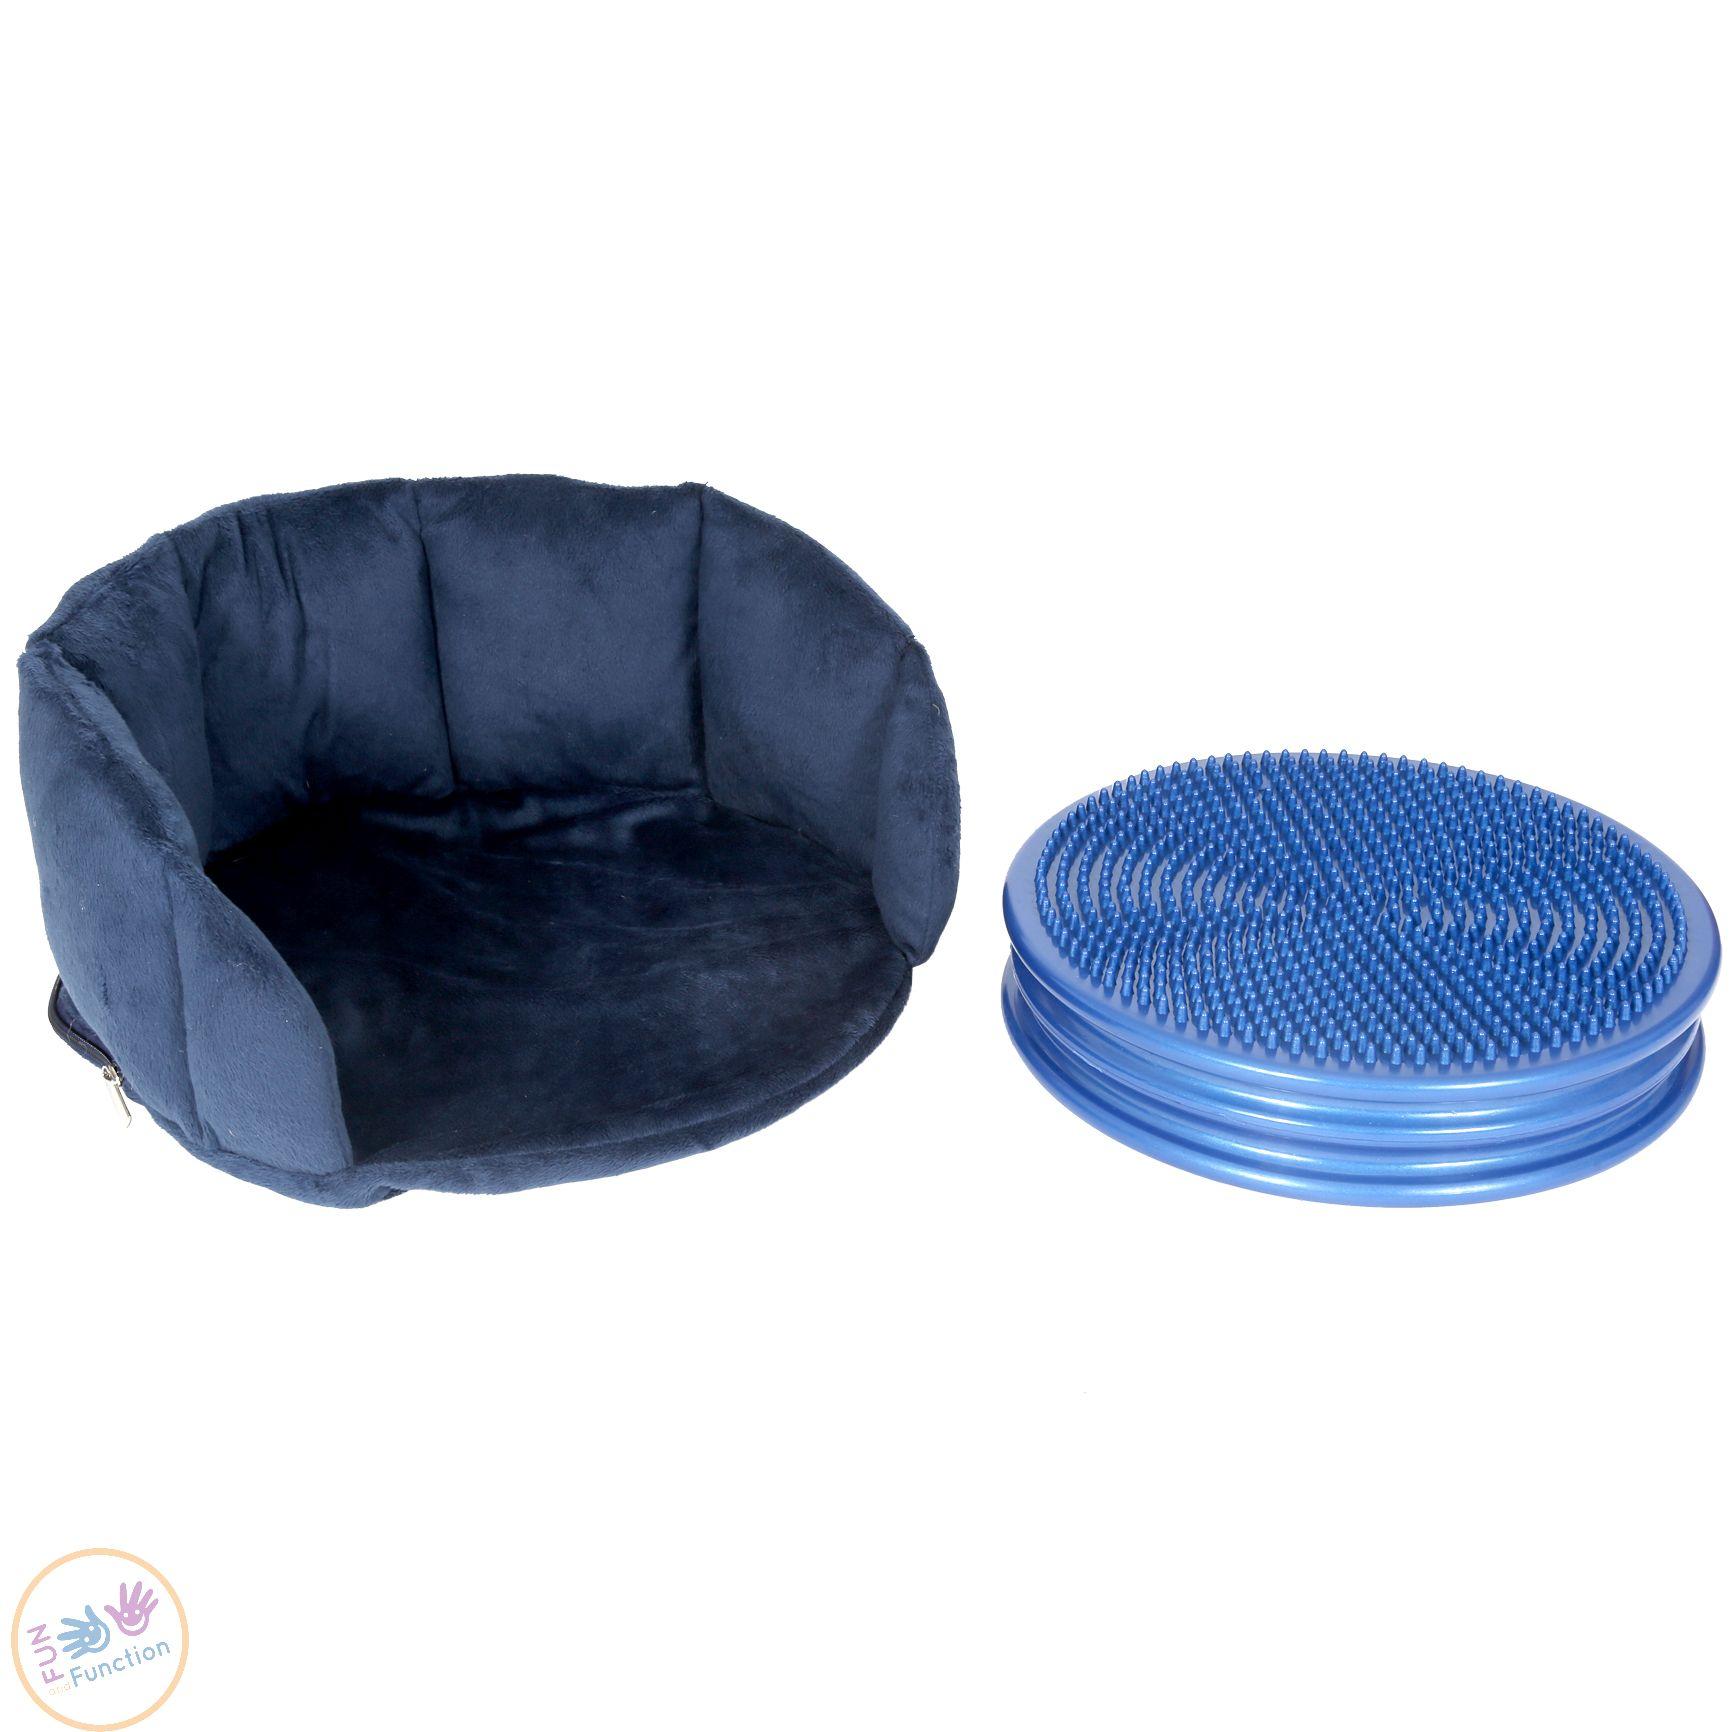 Wiggle seat and cushion